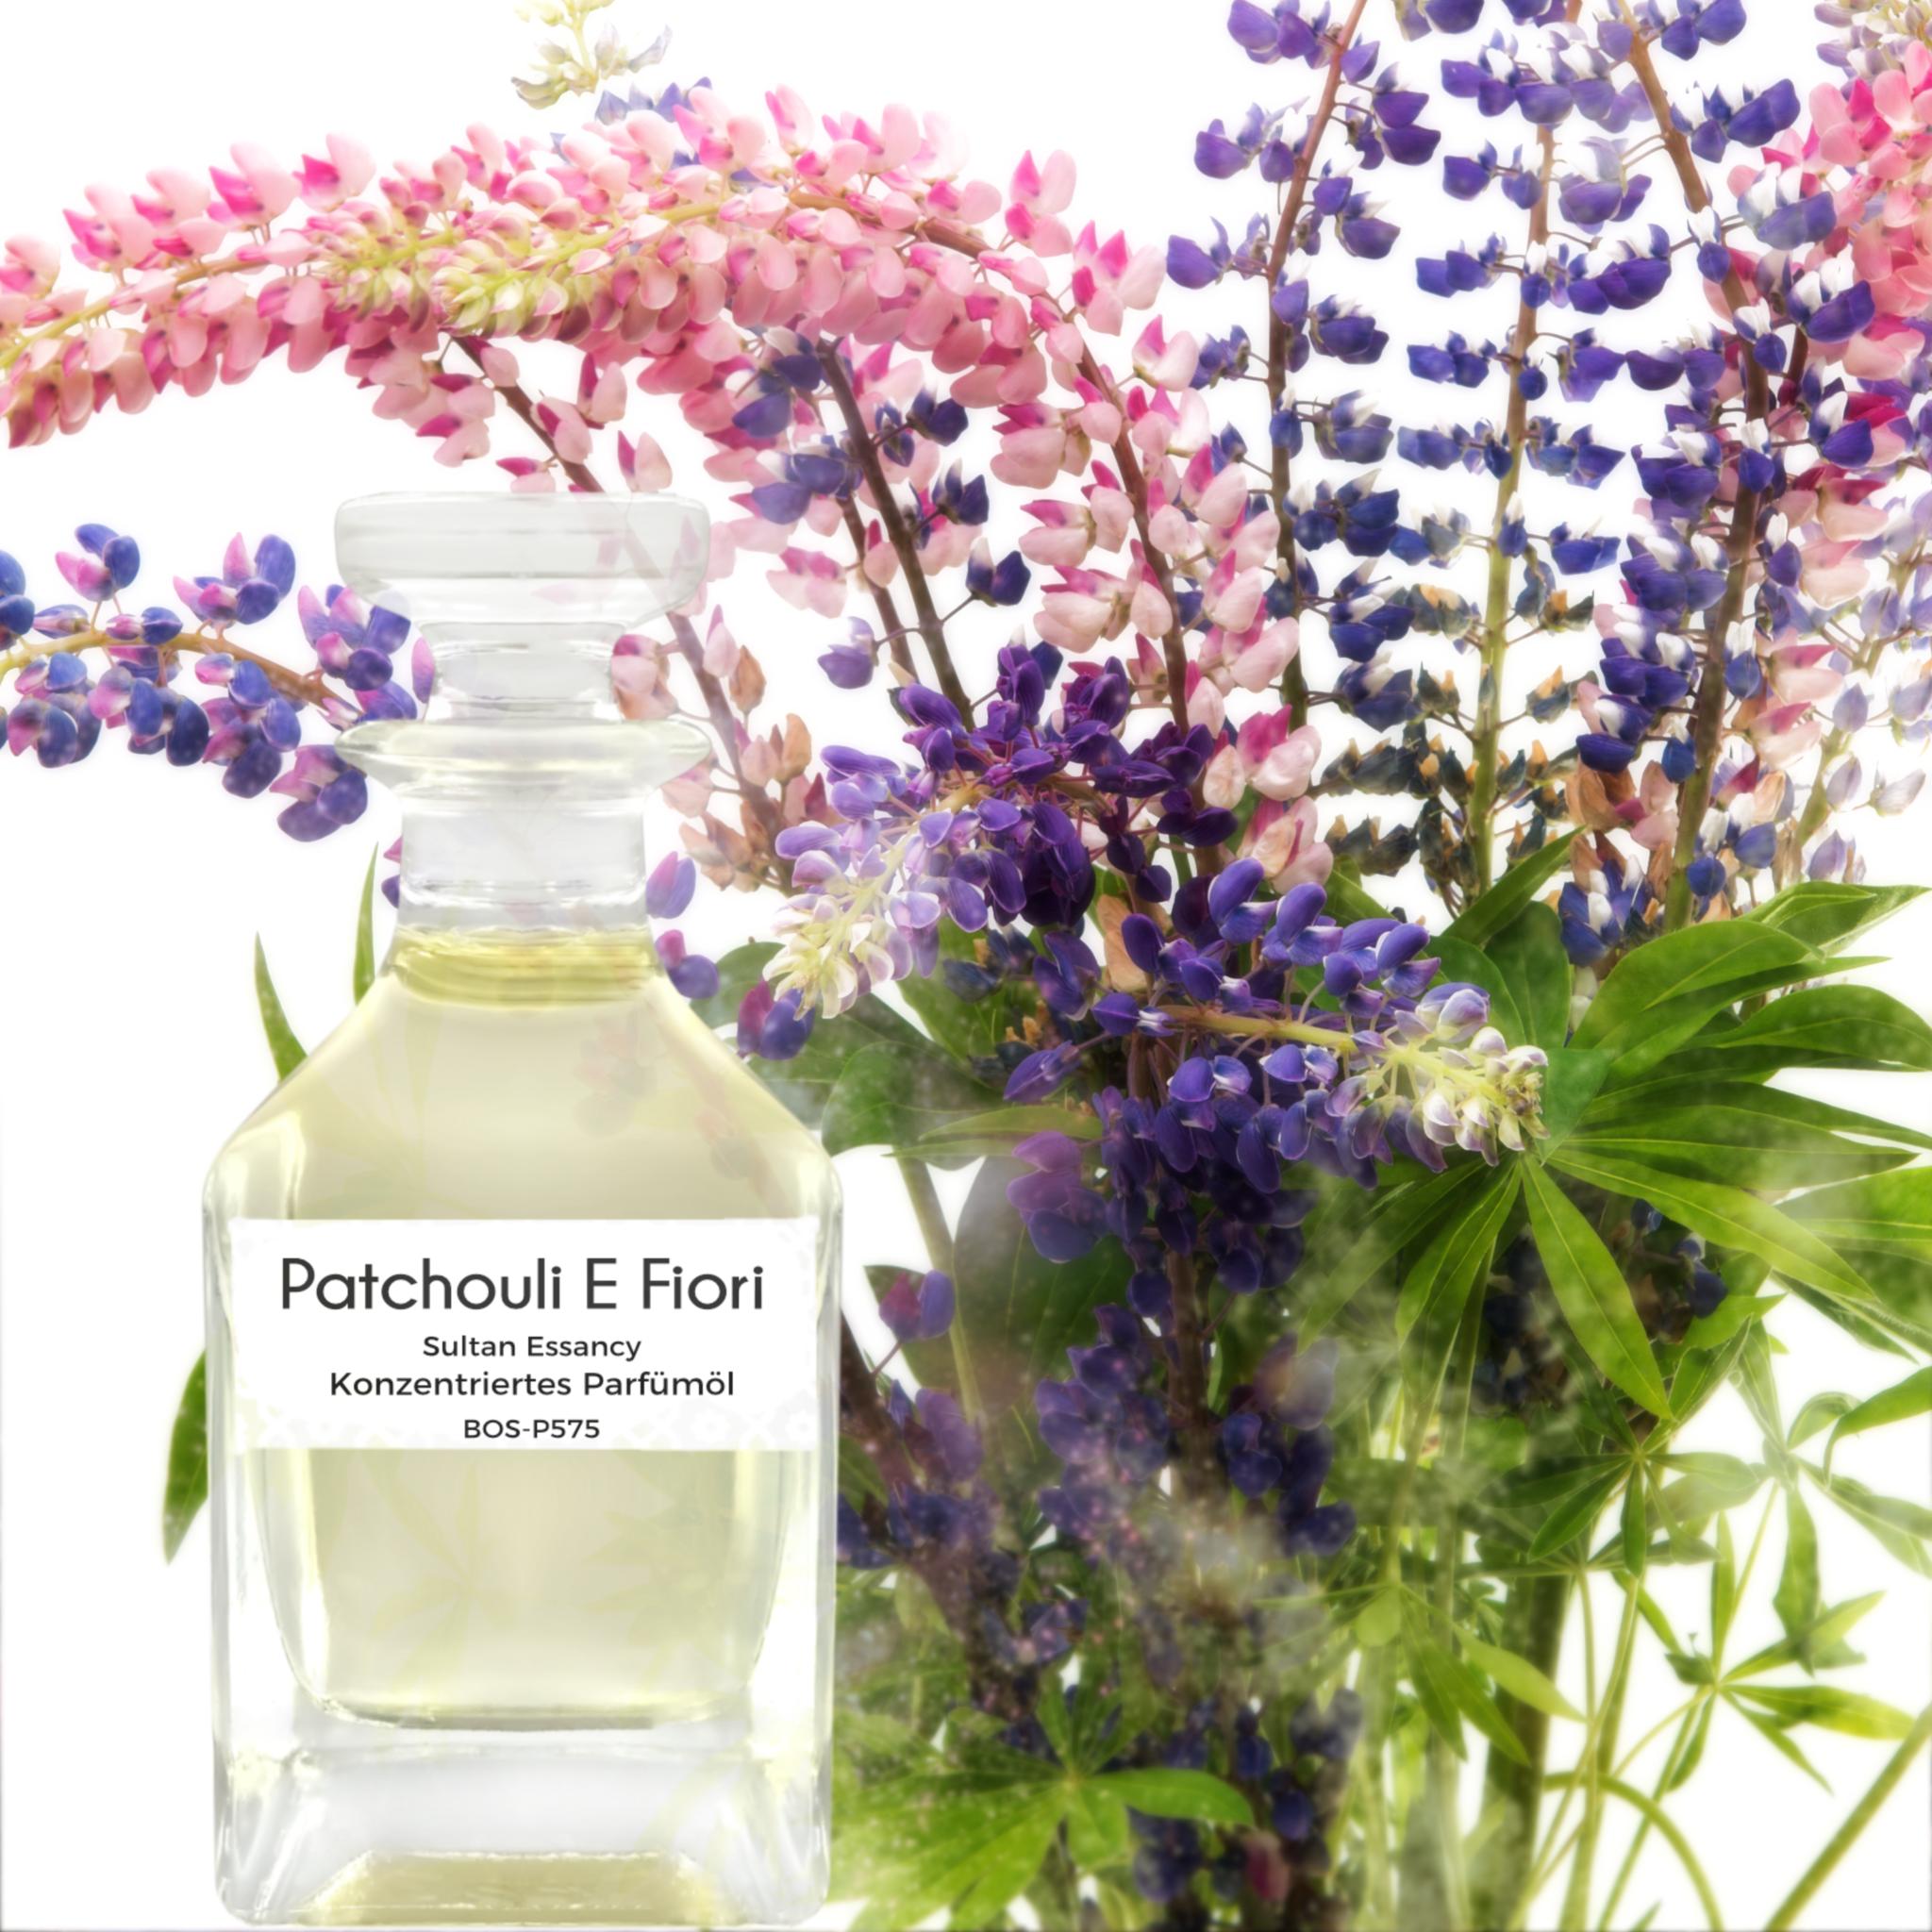 Parfümöl Patchouli E Fiori von Sultan Essancy